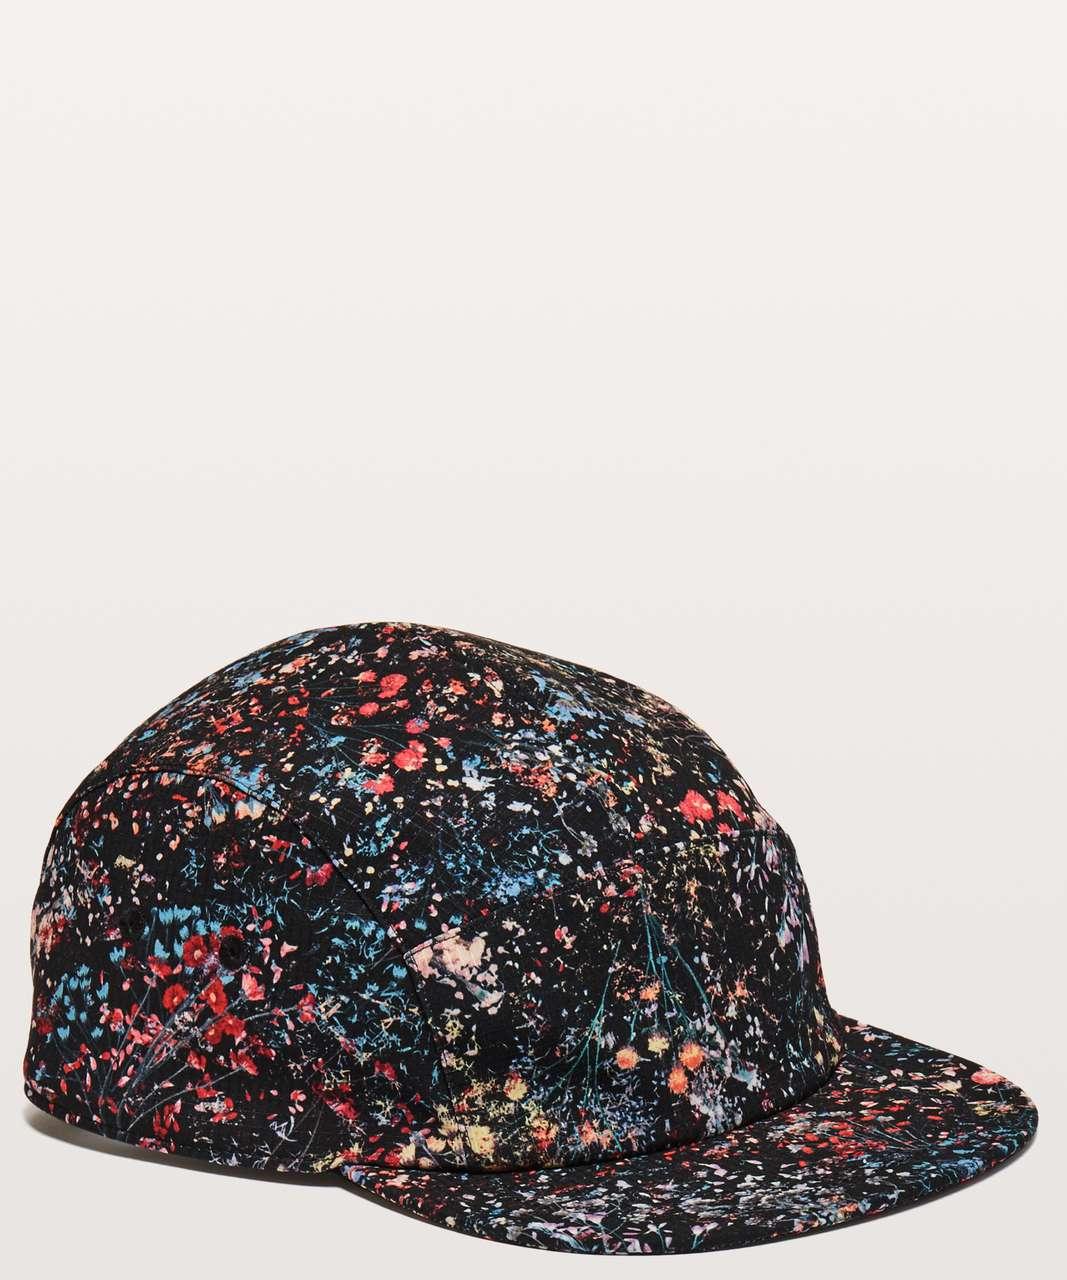 Lululemon Five Times Hat - Flowerescent Multi